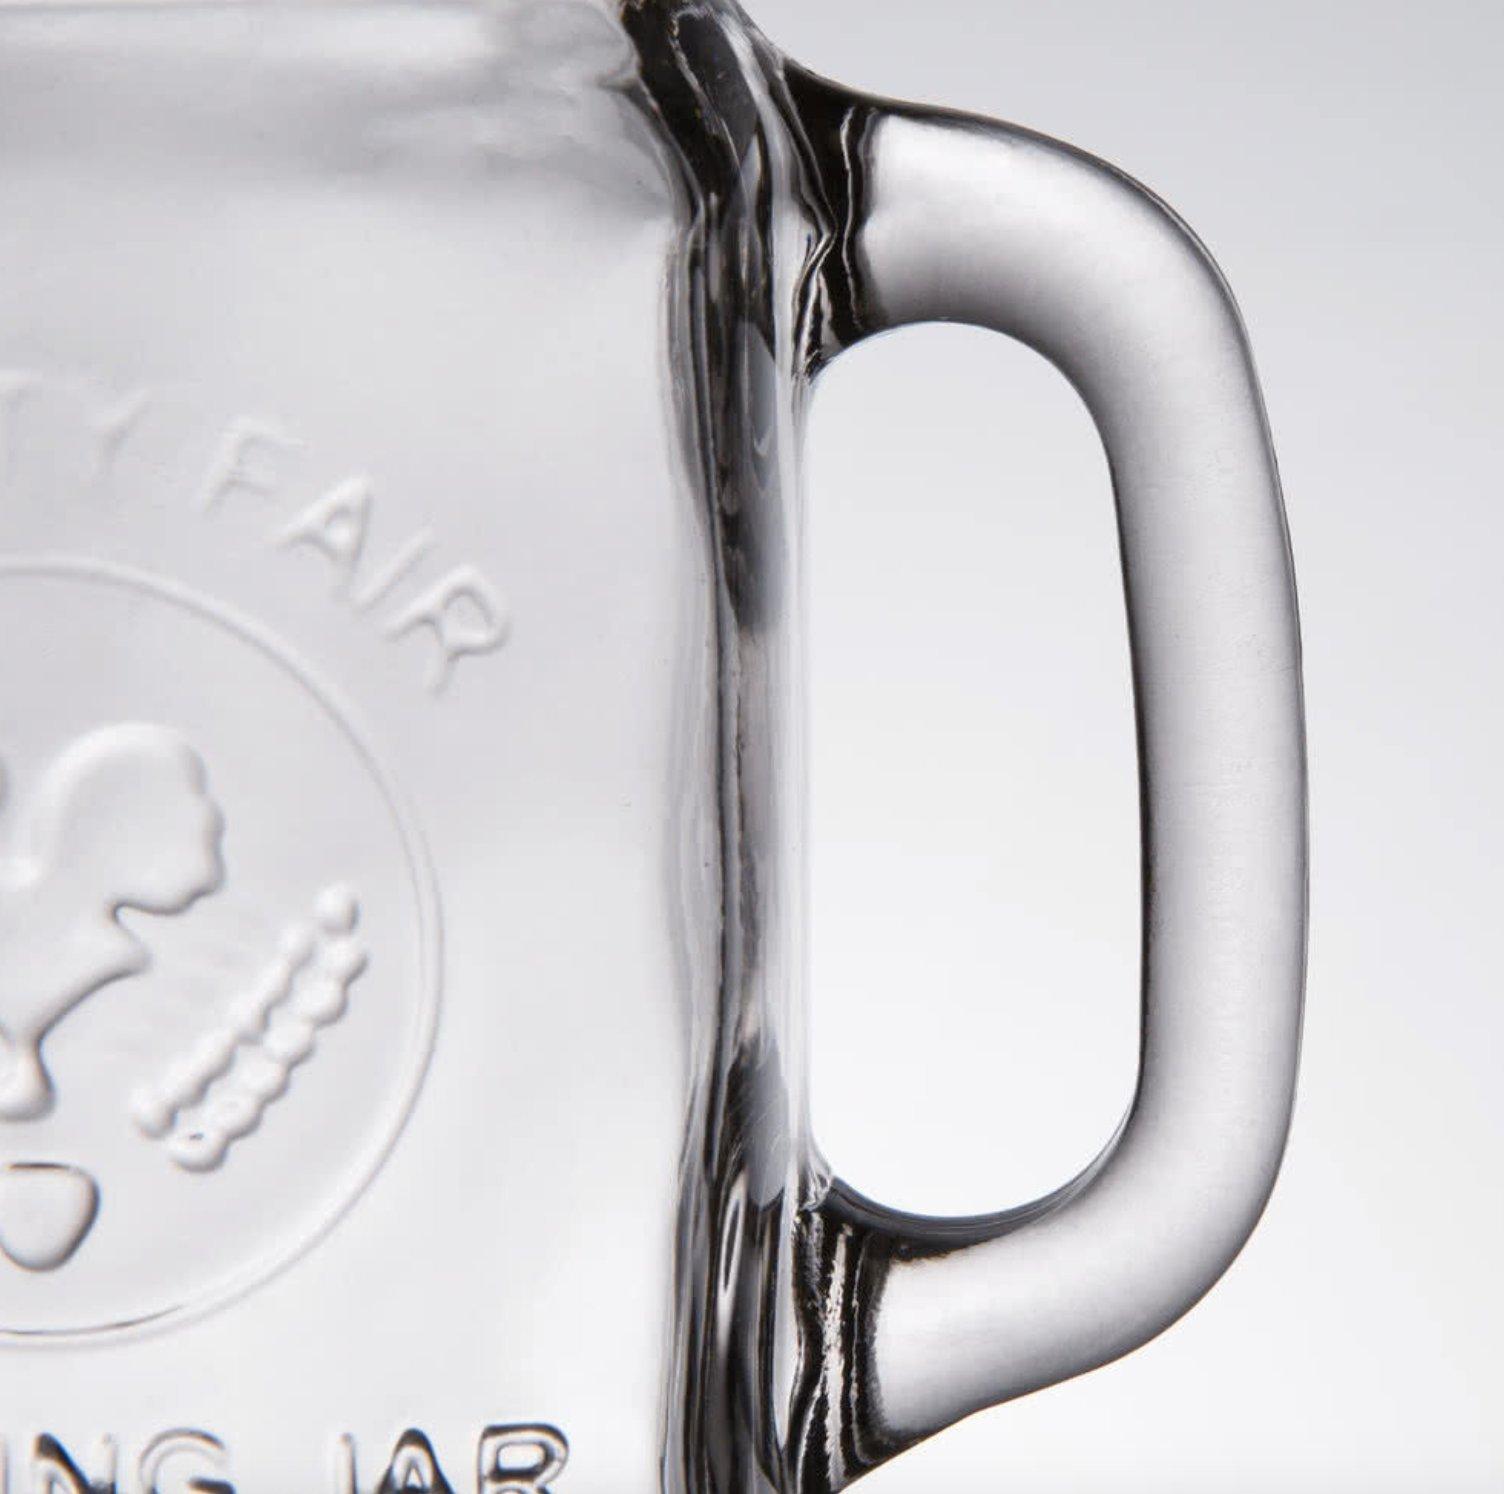 200/CASE 16 Oz Glass Mason COUNTY FAIR Canning Drinking Jar with Handle Wedding (PLUS 4 PCS FREE)